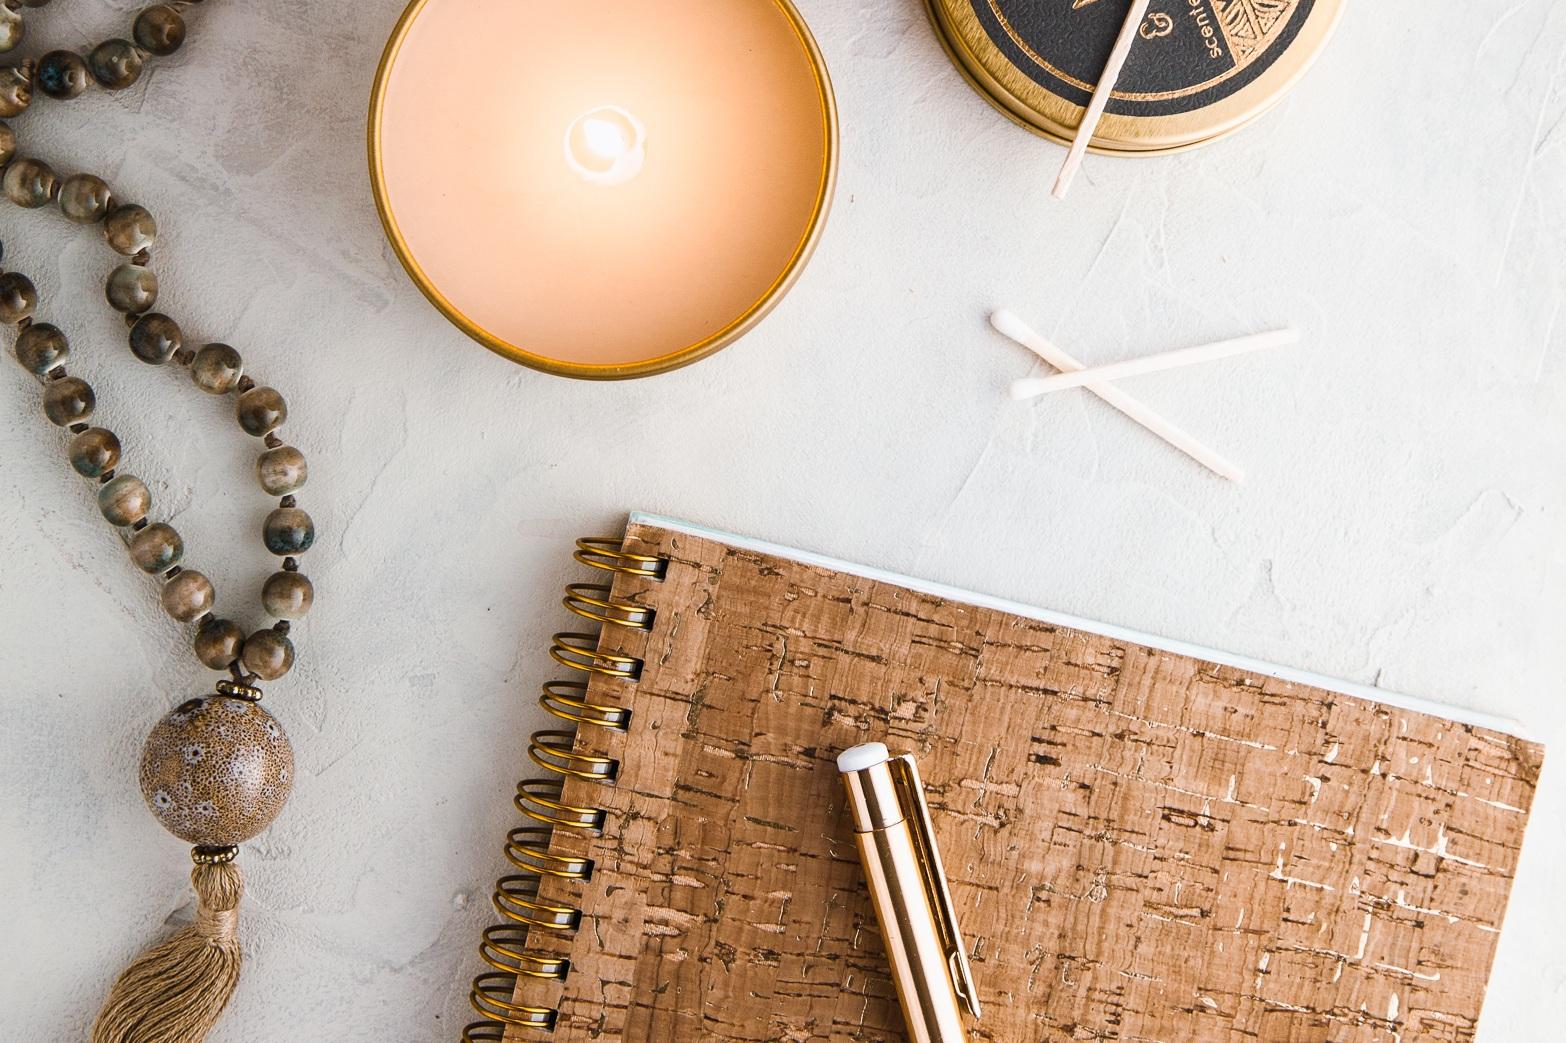 Creative_Entrepreneur_tools_For_Balance.jpg